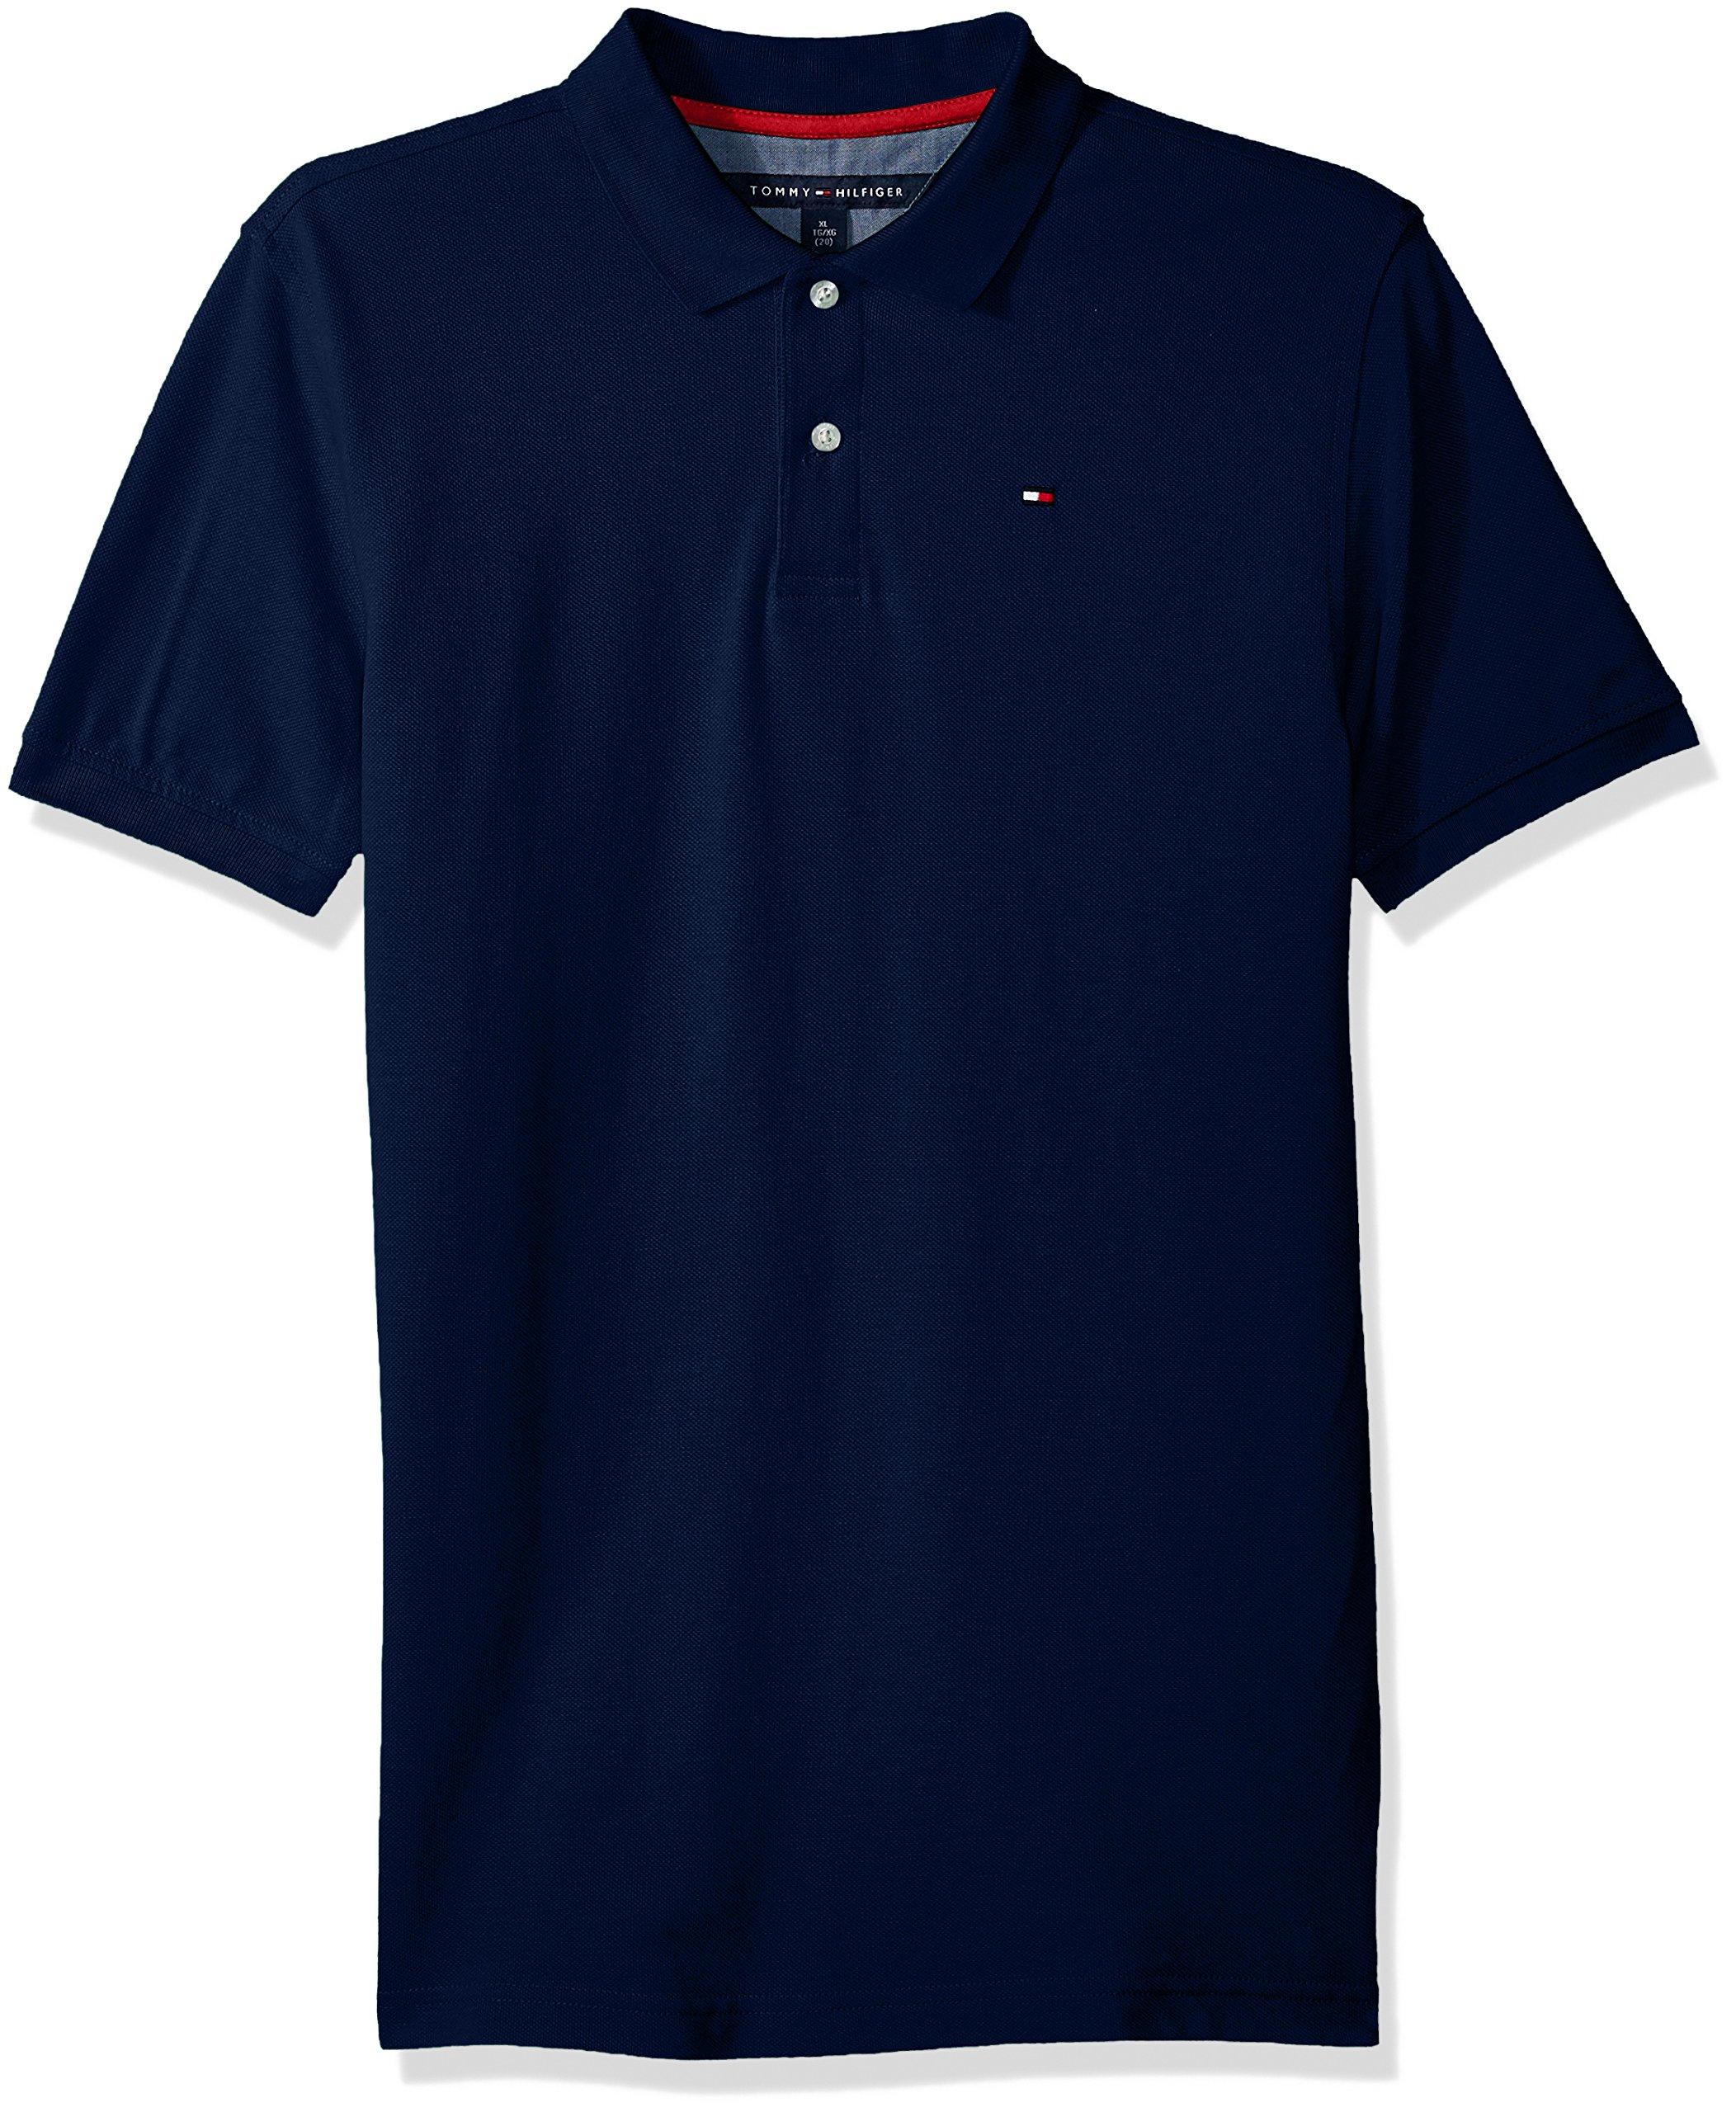 Tommy Hilfiger Boys' Little Short Sleeve Solid Ivy Polo Shirt, Estate Blue, 4